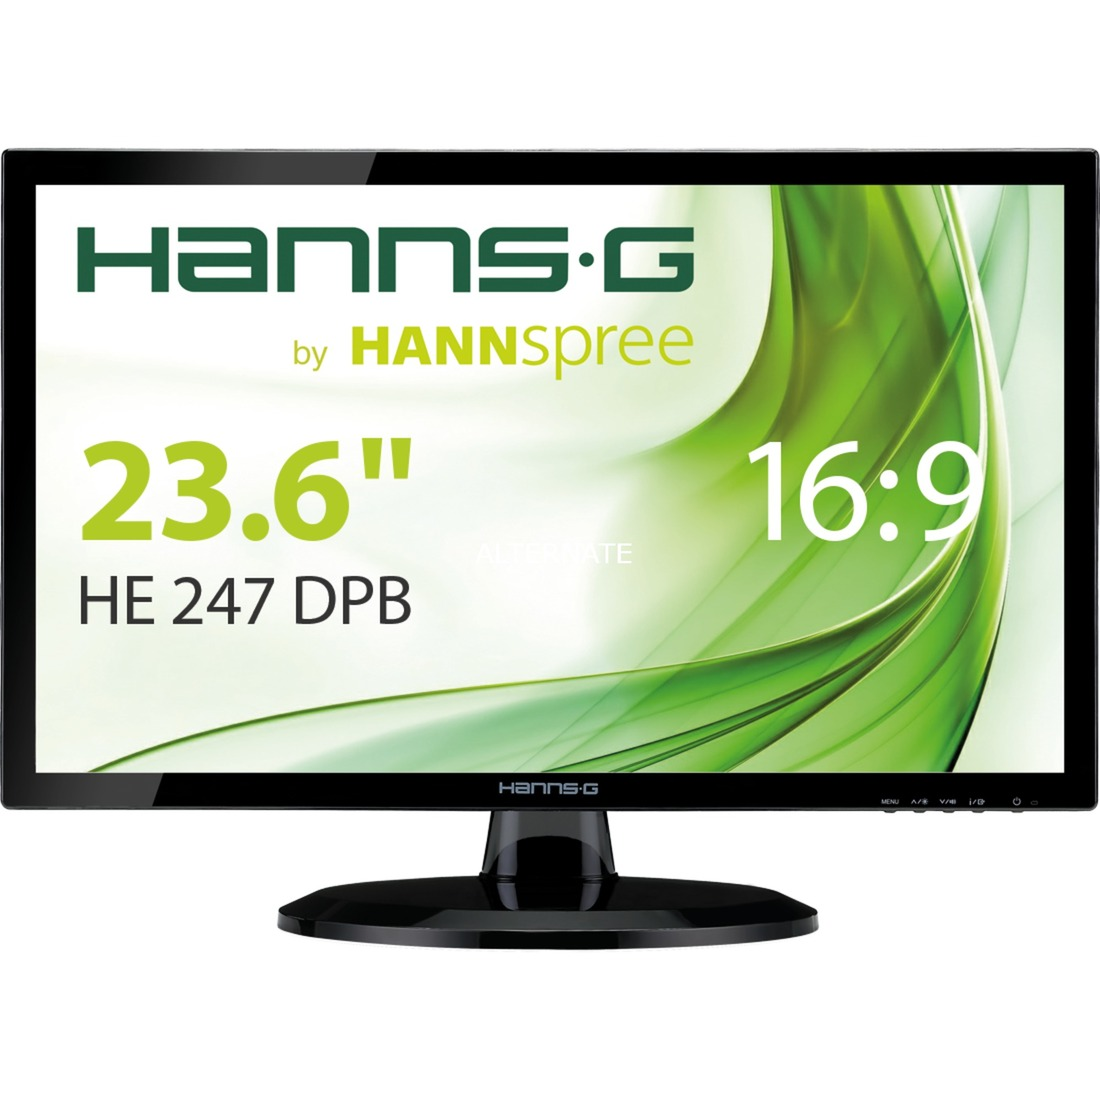 "Hanns.G HE247DPB LED display 59,9 cm (23.6"") Full HD Black, Monitor LED"